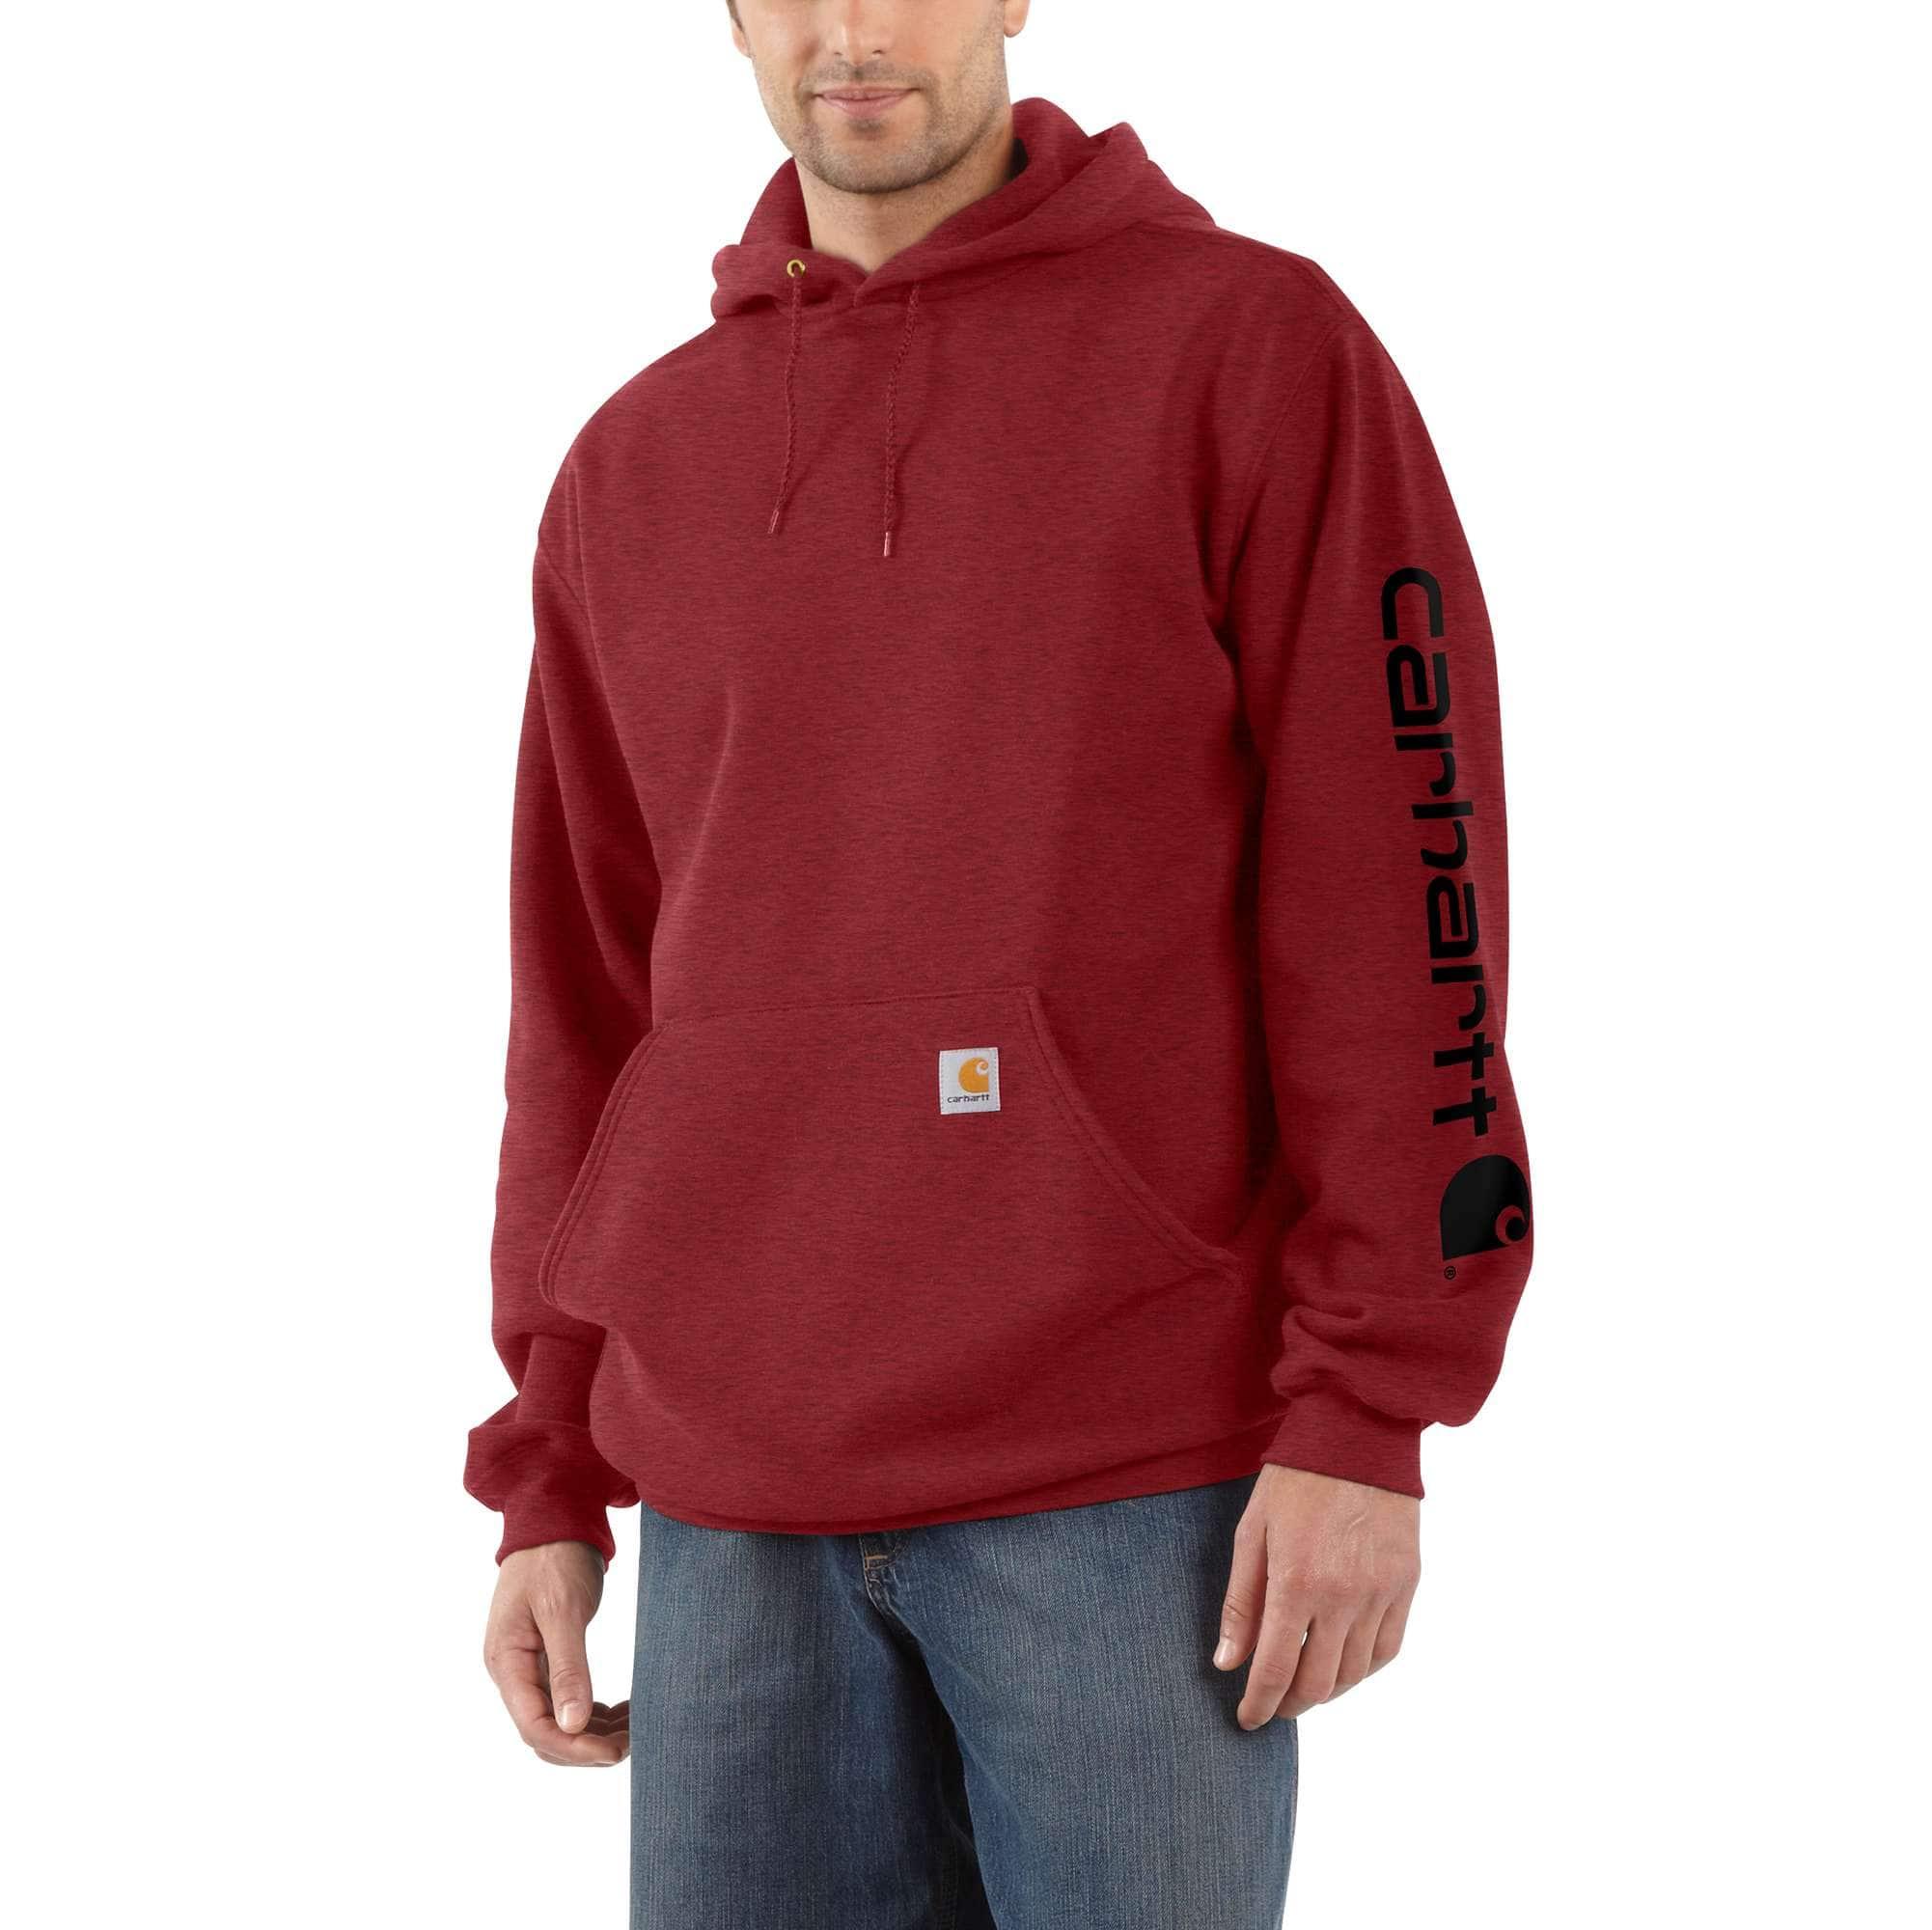 Men's Midweight Hooded Logo Sweatshirt K2